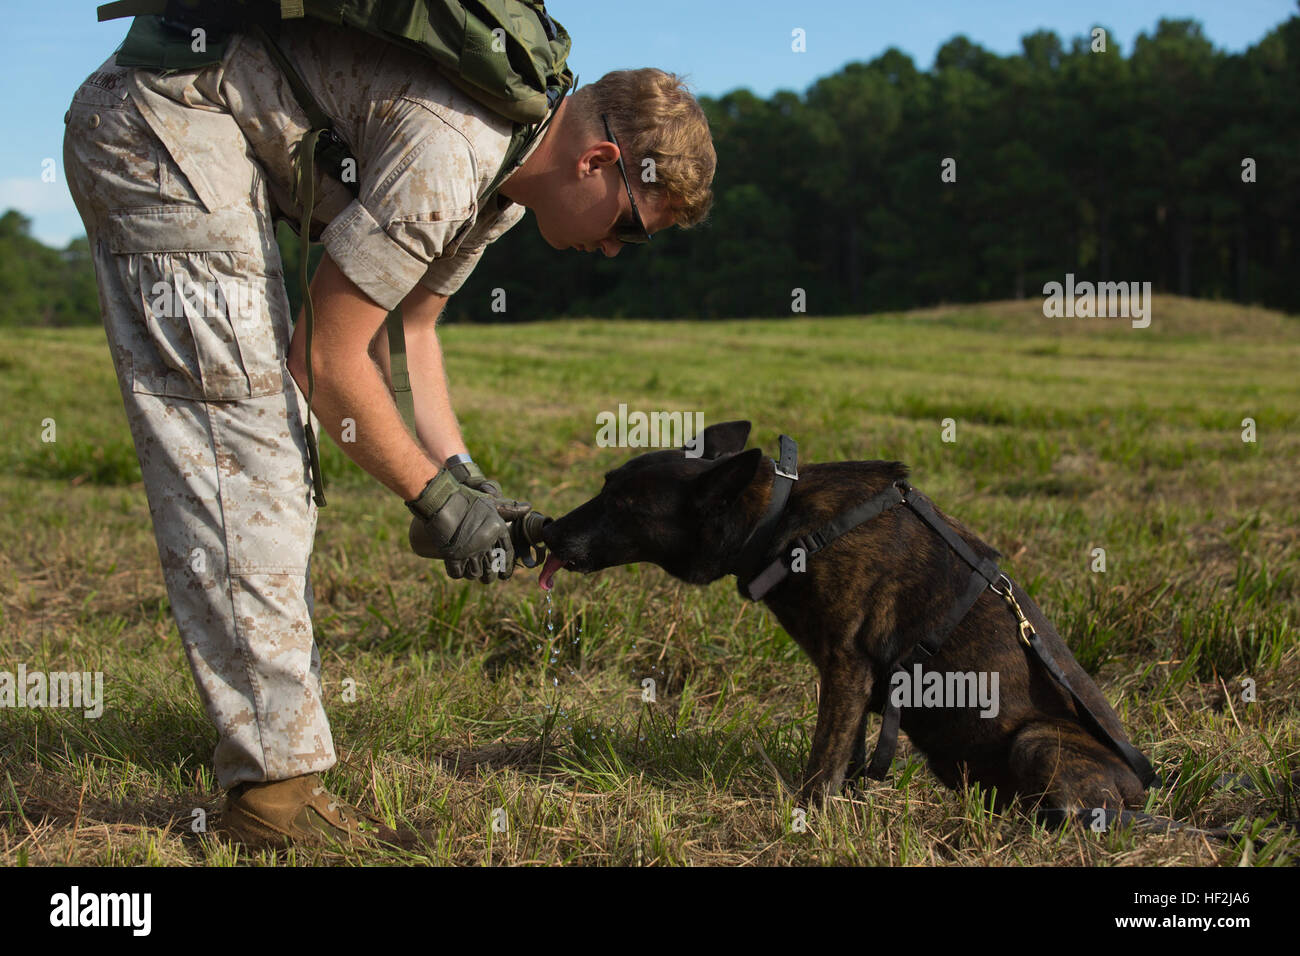 Bau- & Konstruktionsspielzeug-Sets Patrouille Hunde Bau/Aufbau